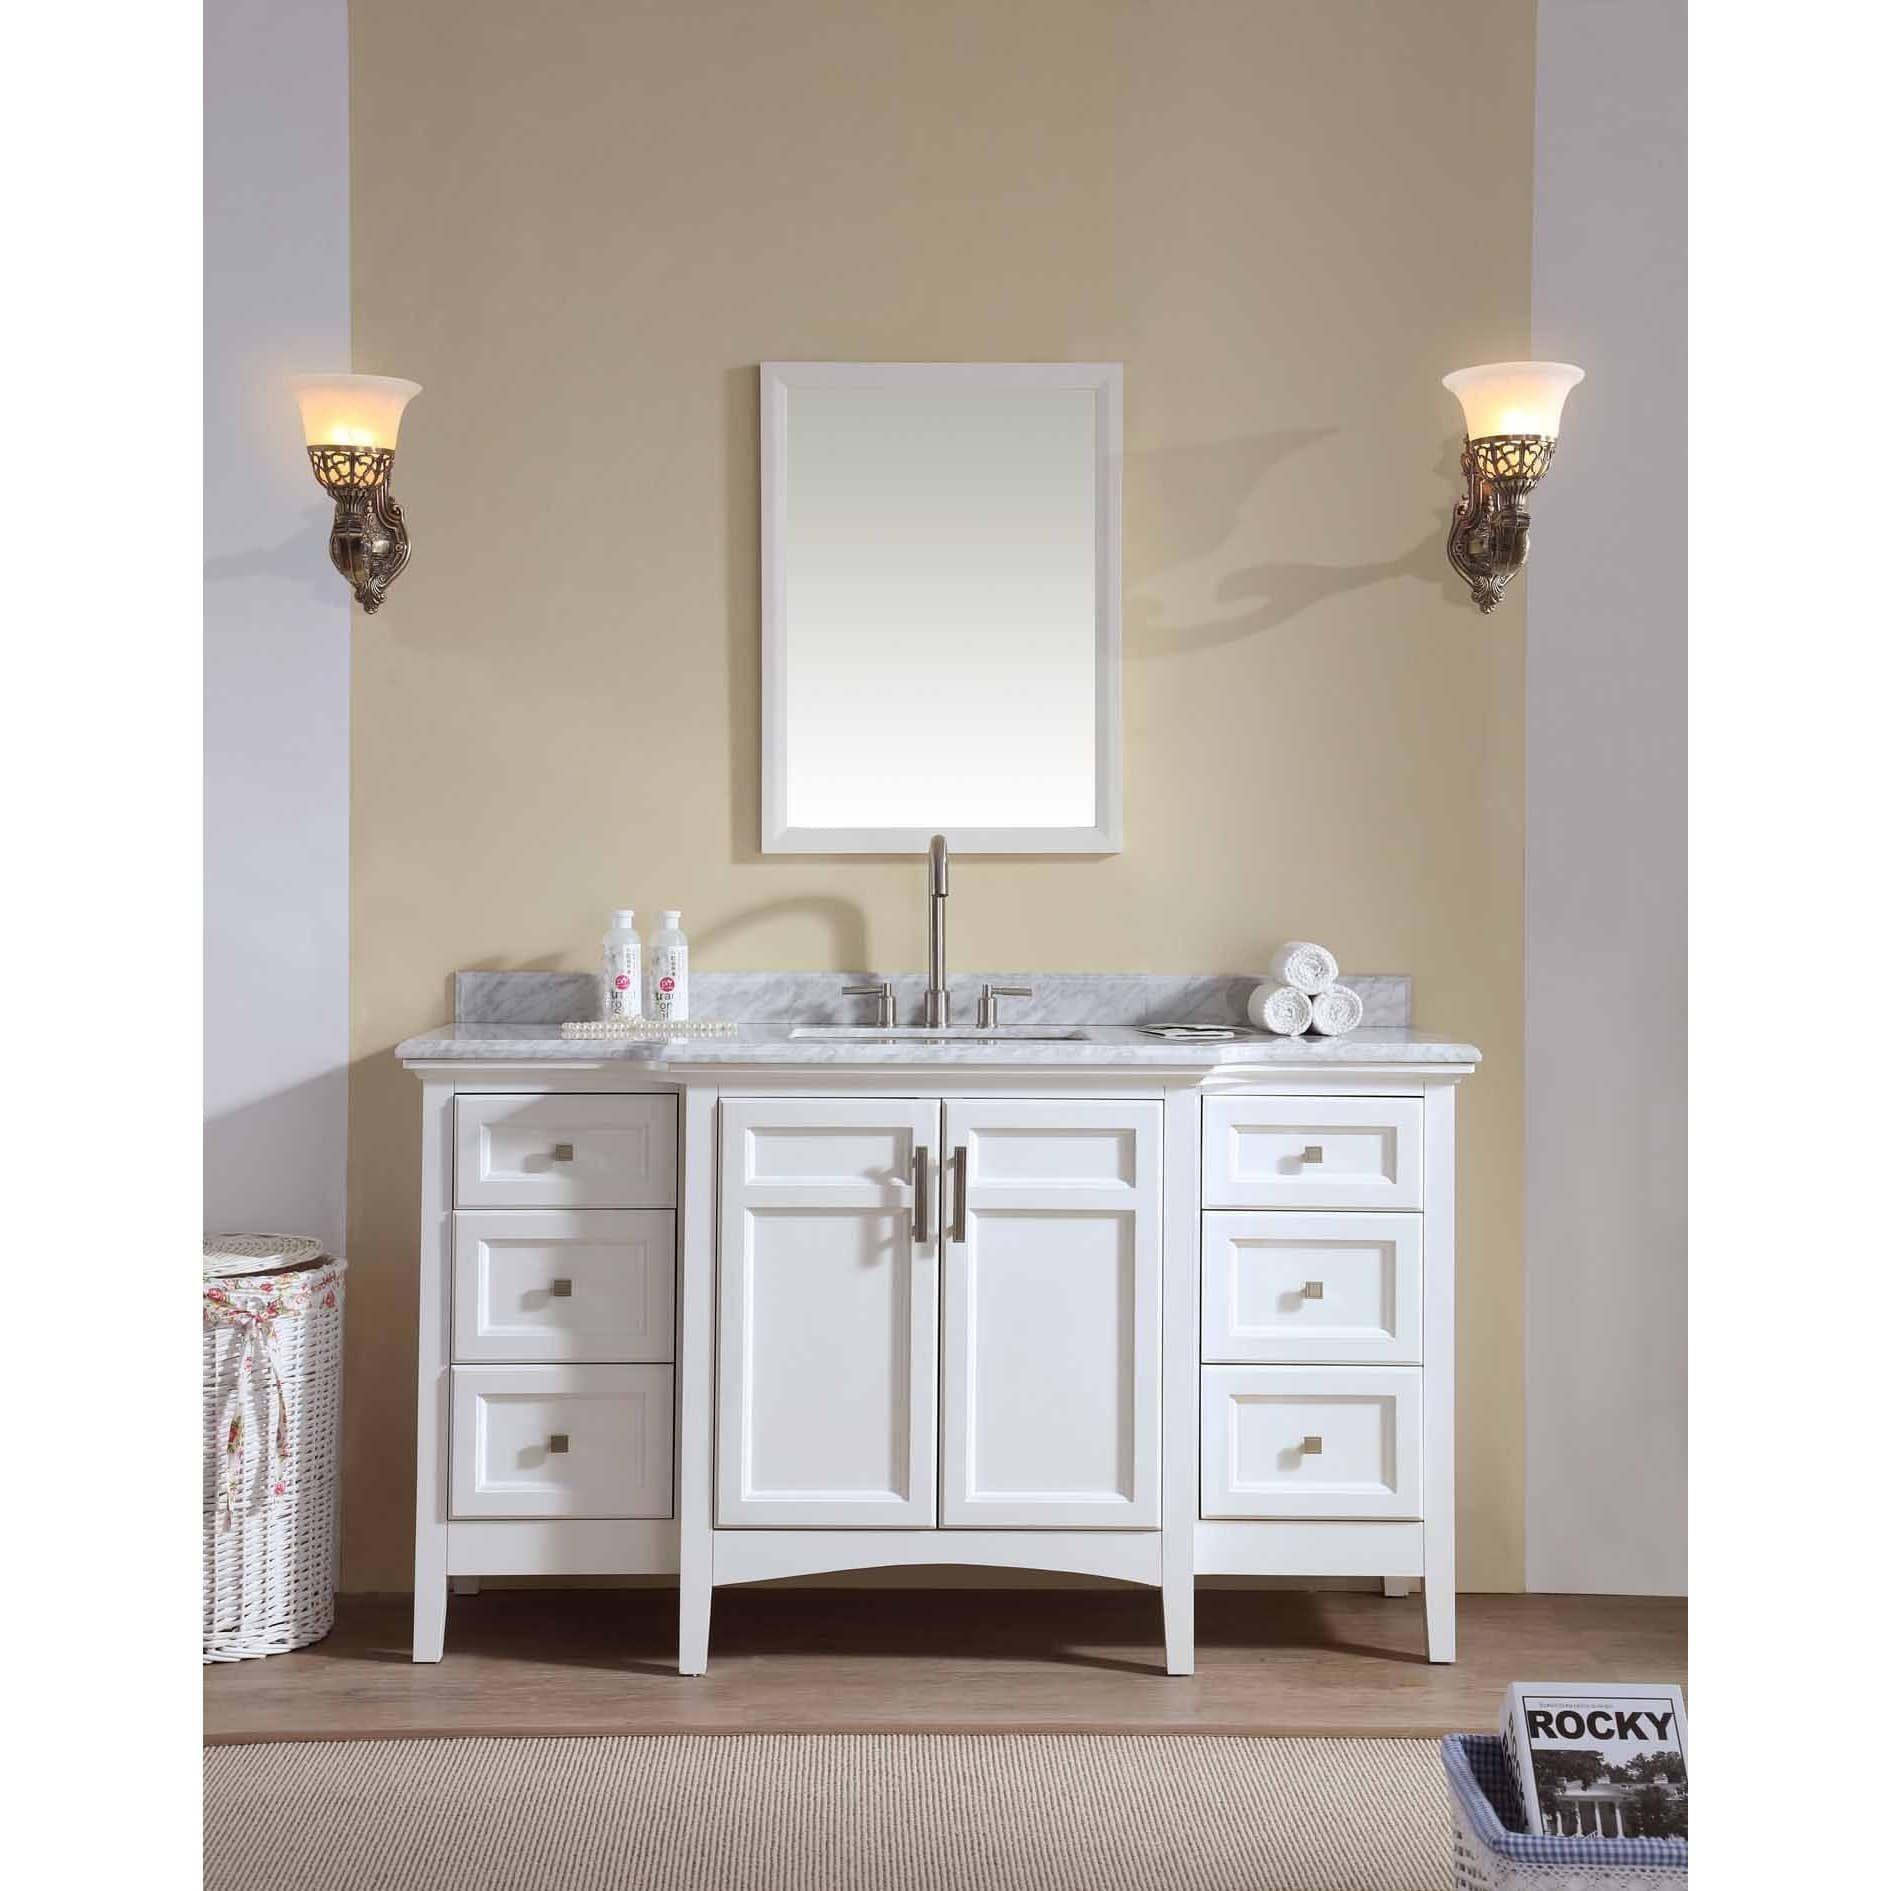 Ari Kitchen and Bath Luz White 60-inch Single Bathroom Vanity Set ...